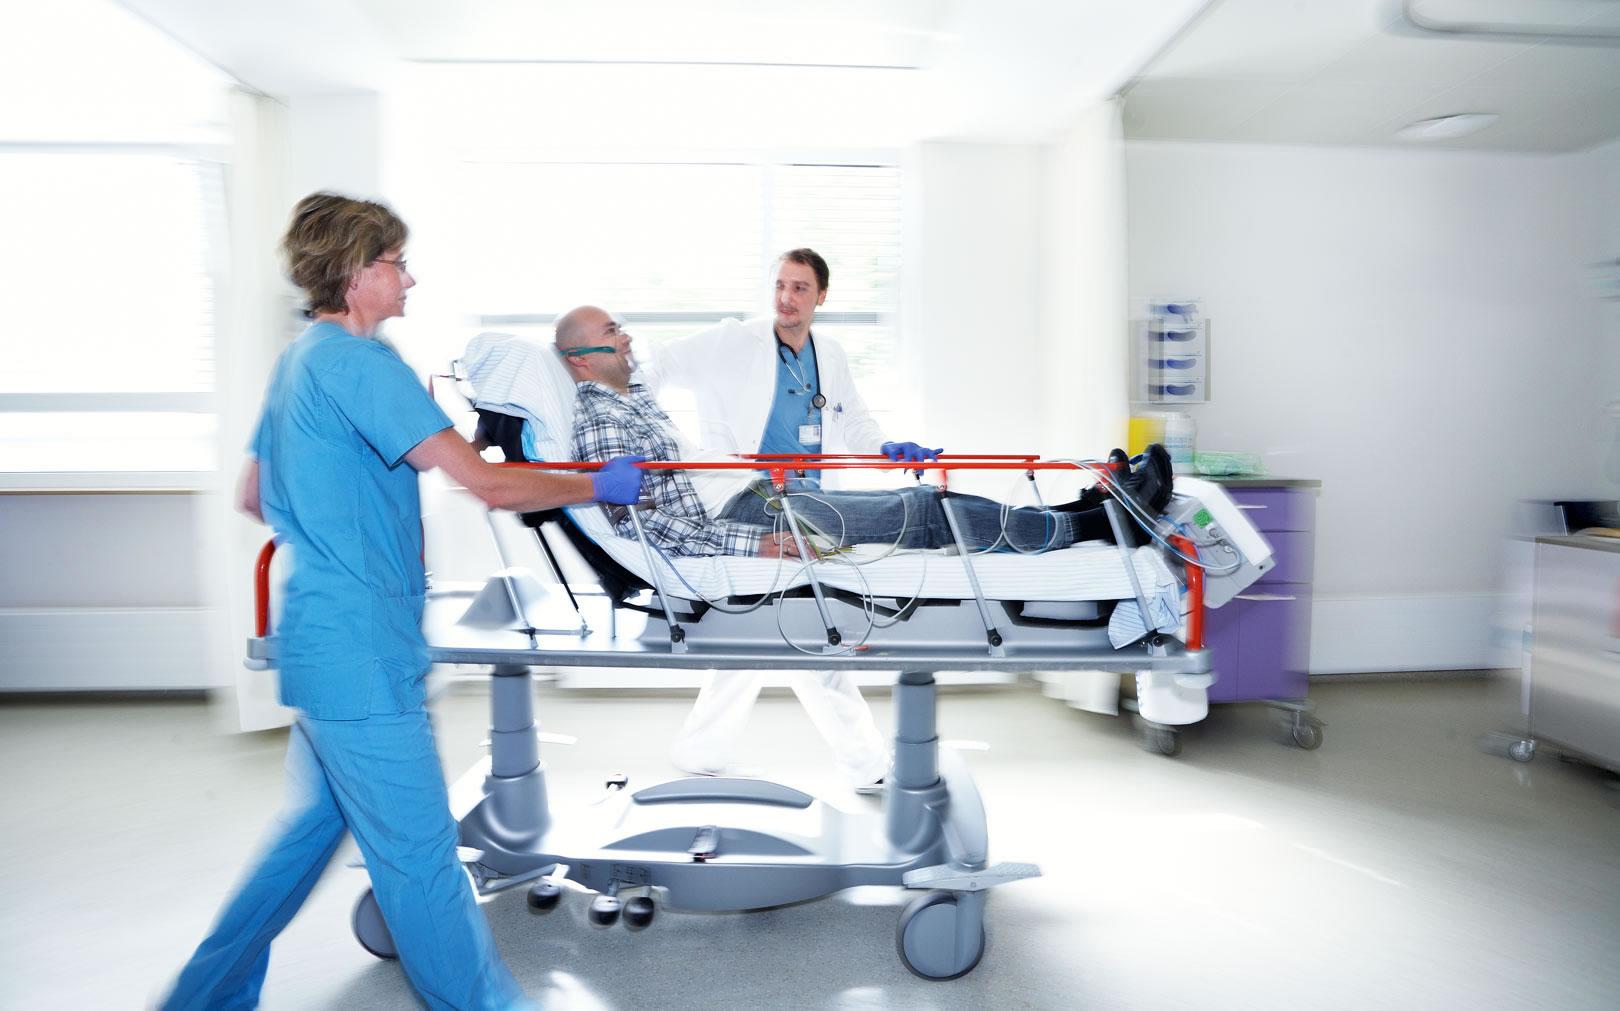 Hospital_05